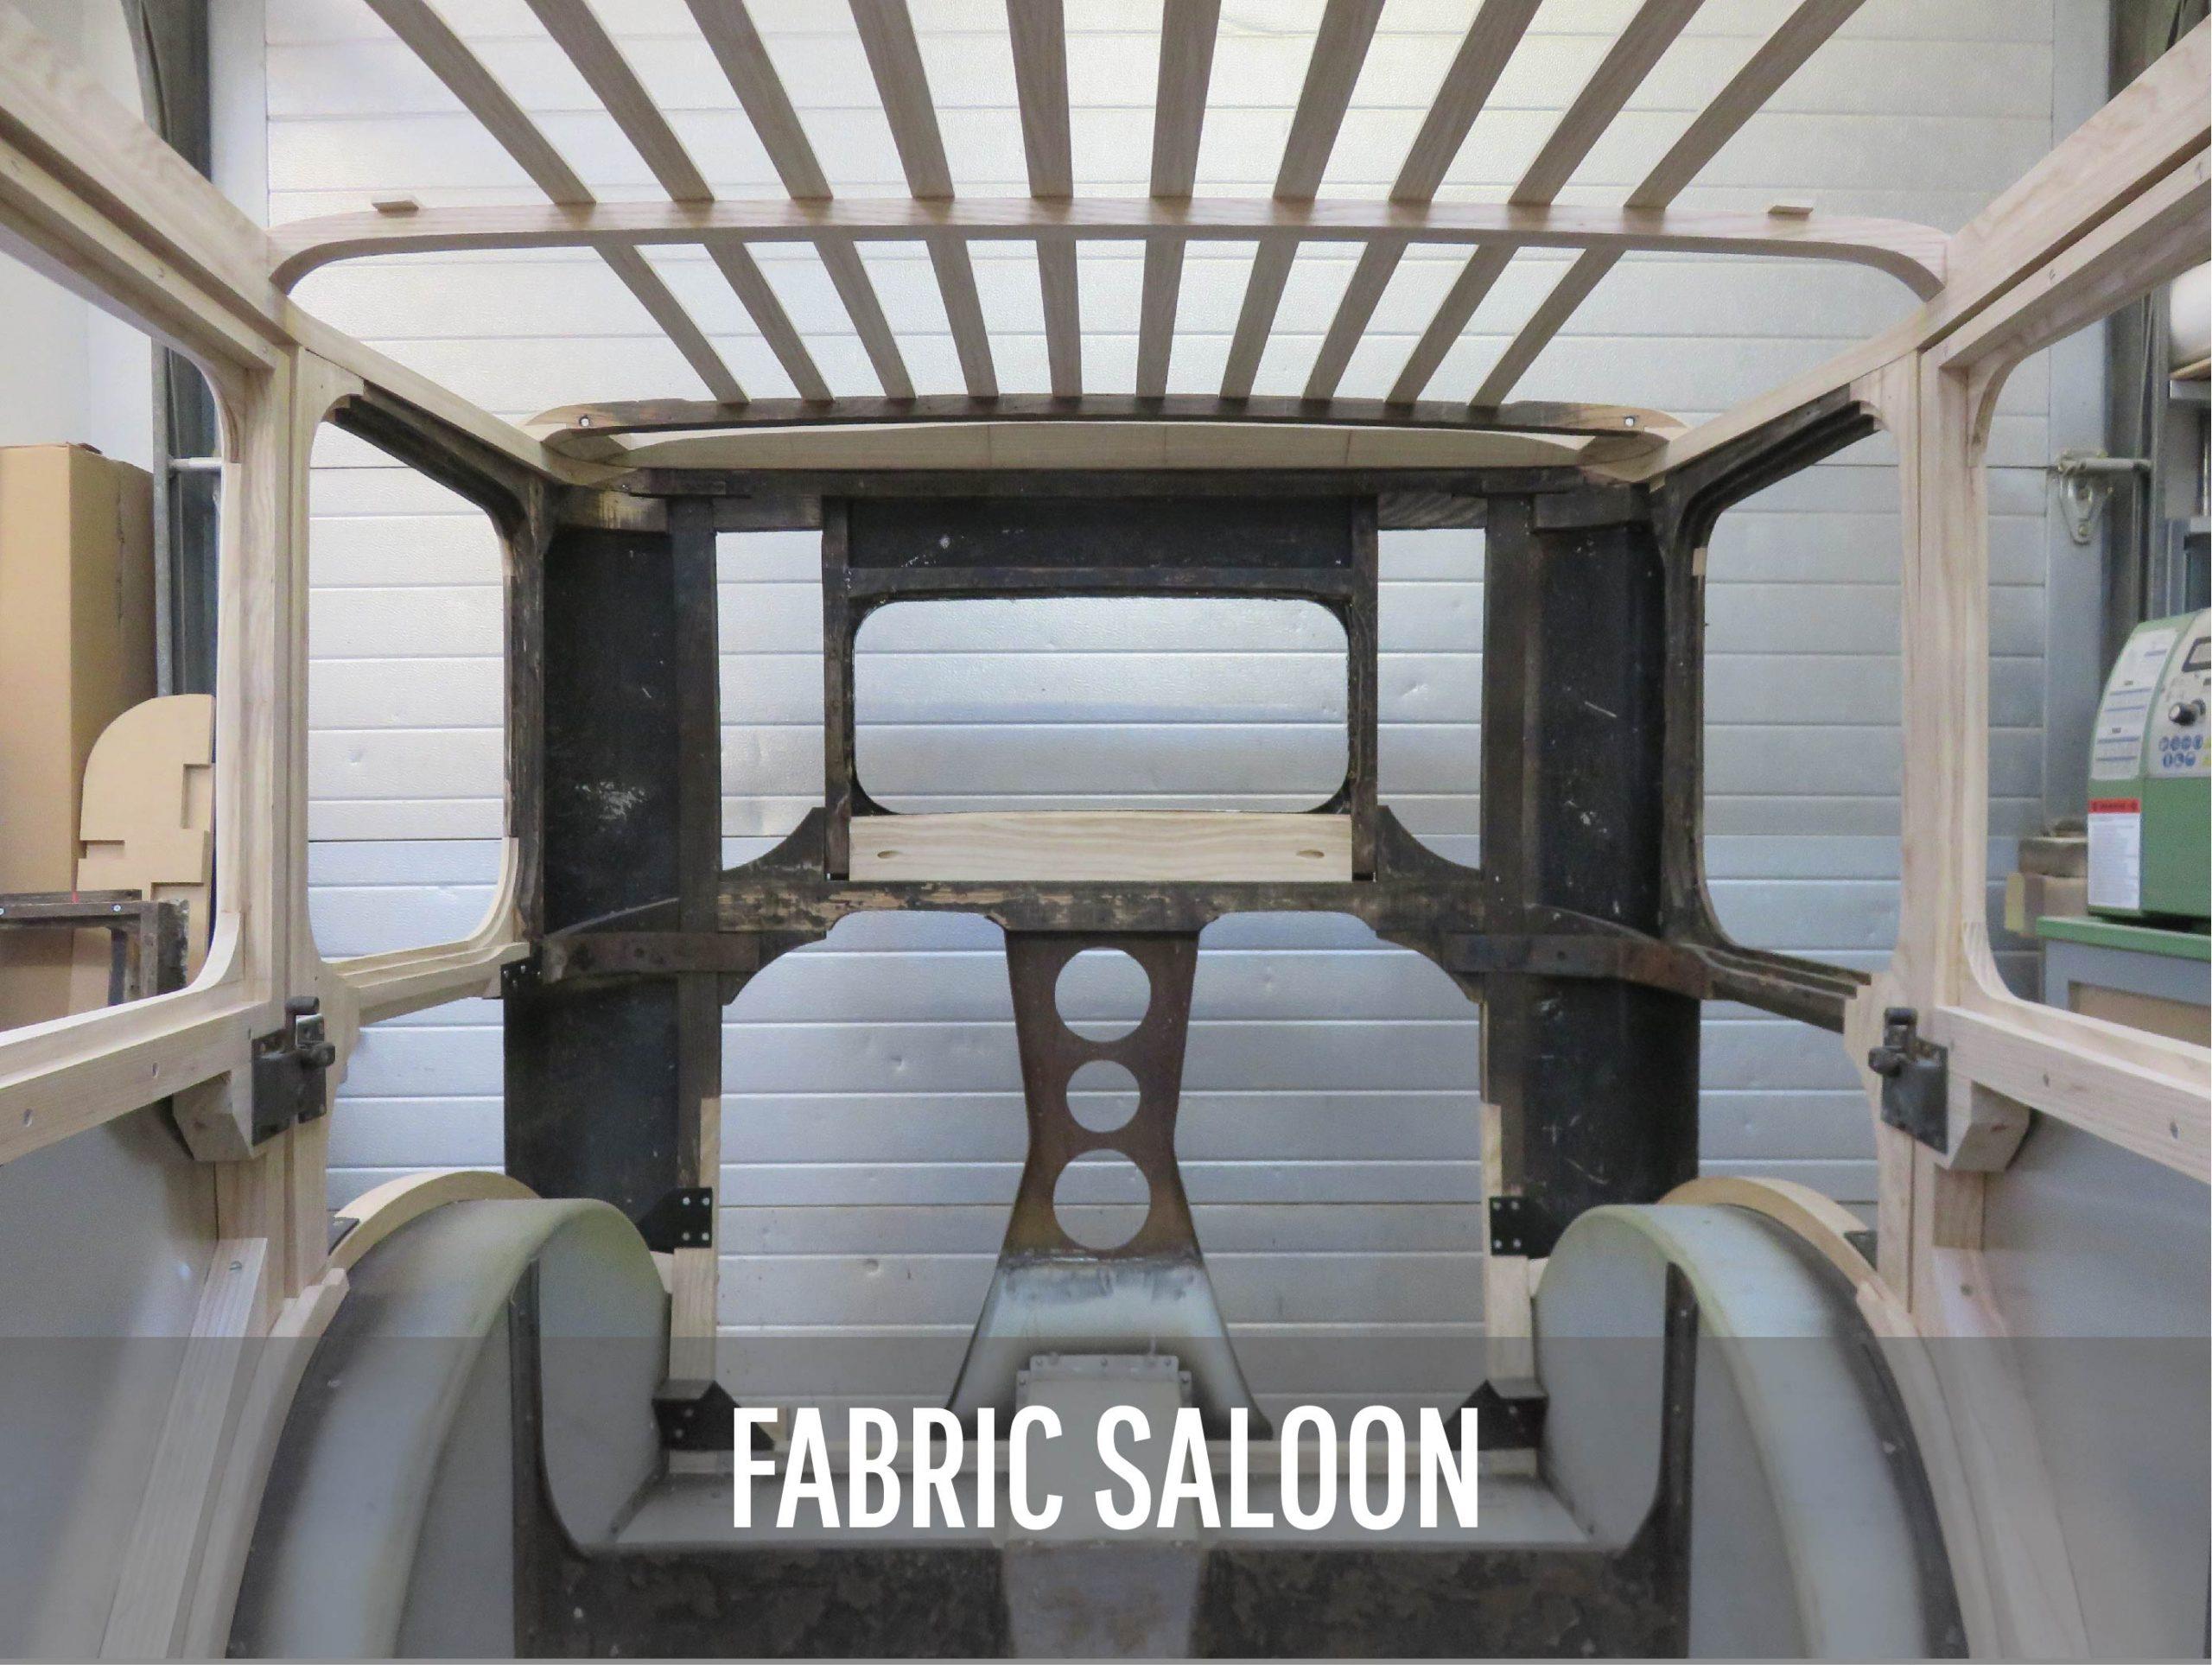 Peter Naulls - Fabric saloon vintage car